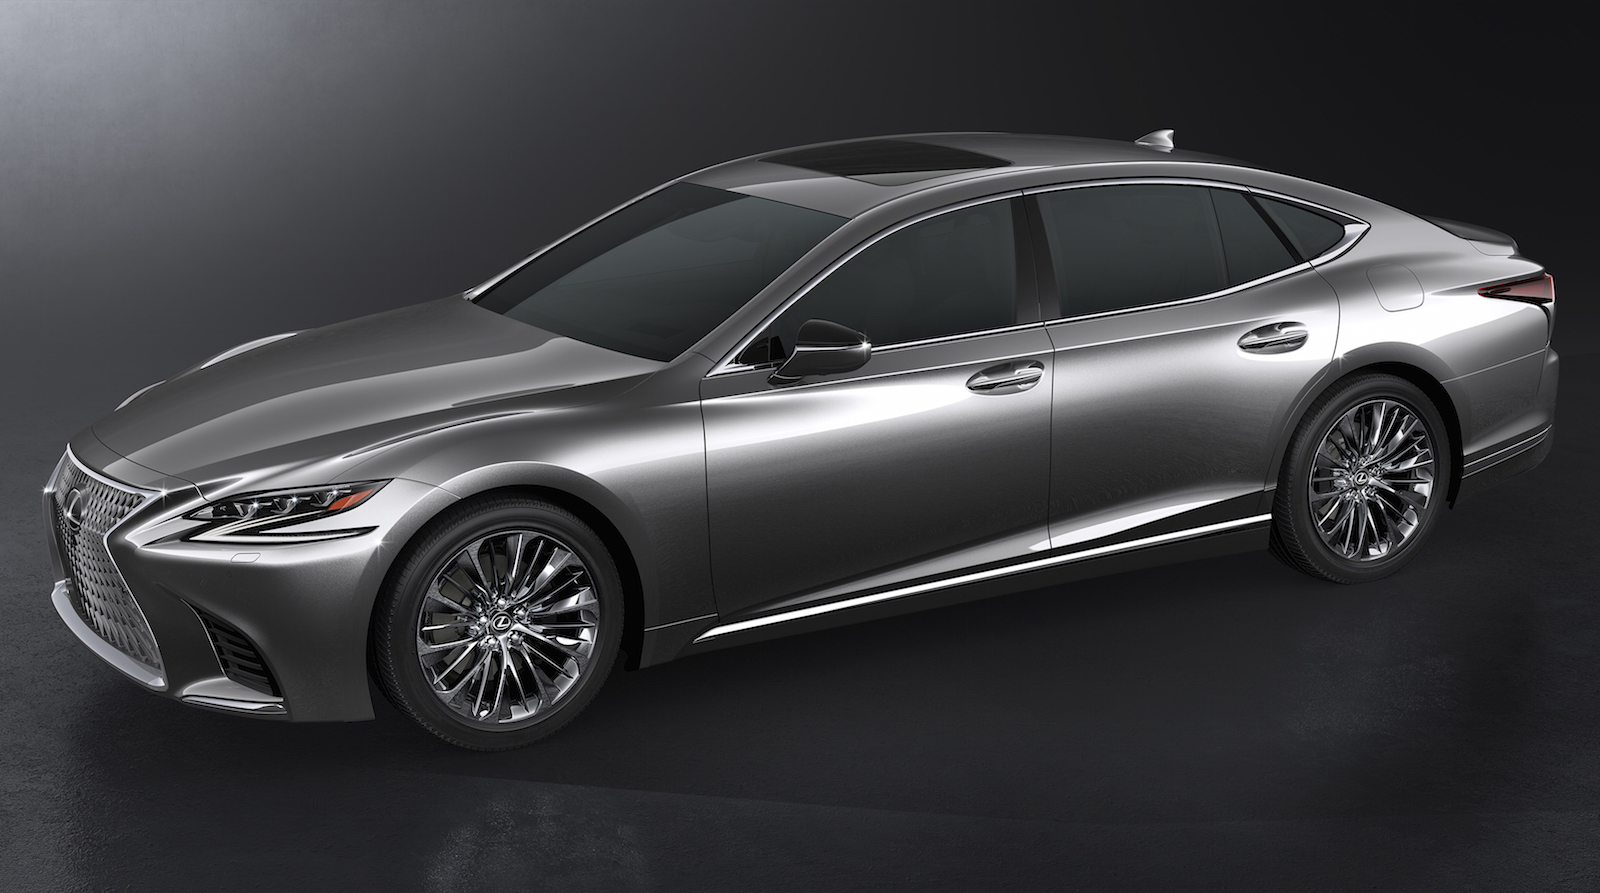 2018 Lexus Ls Revealed Debuts 3 5tt V6 10spd Auto Performancedrive